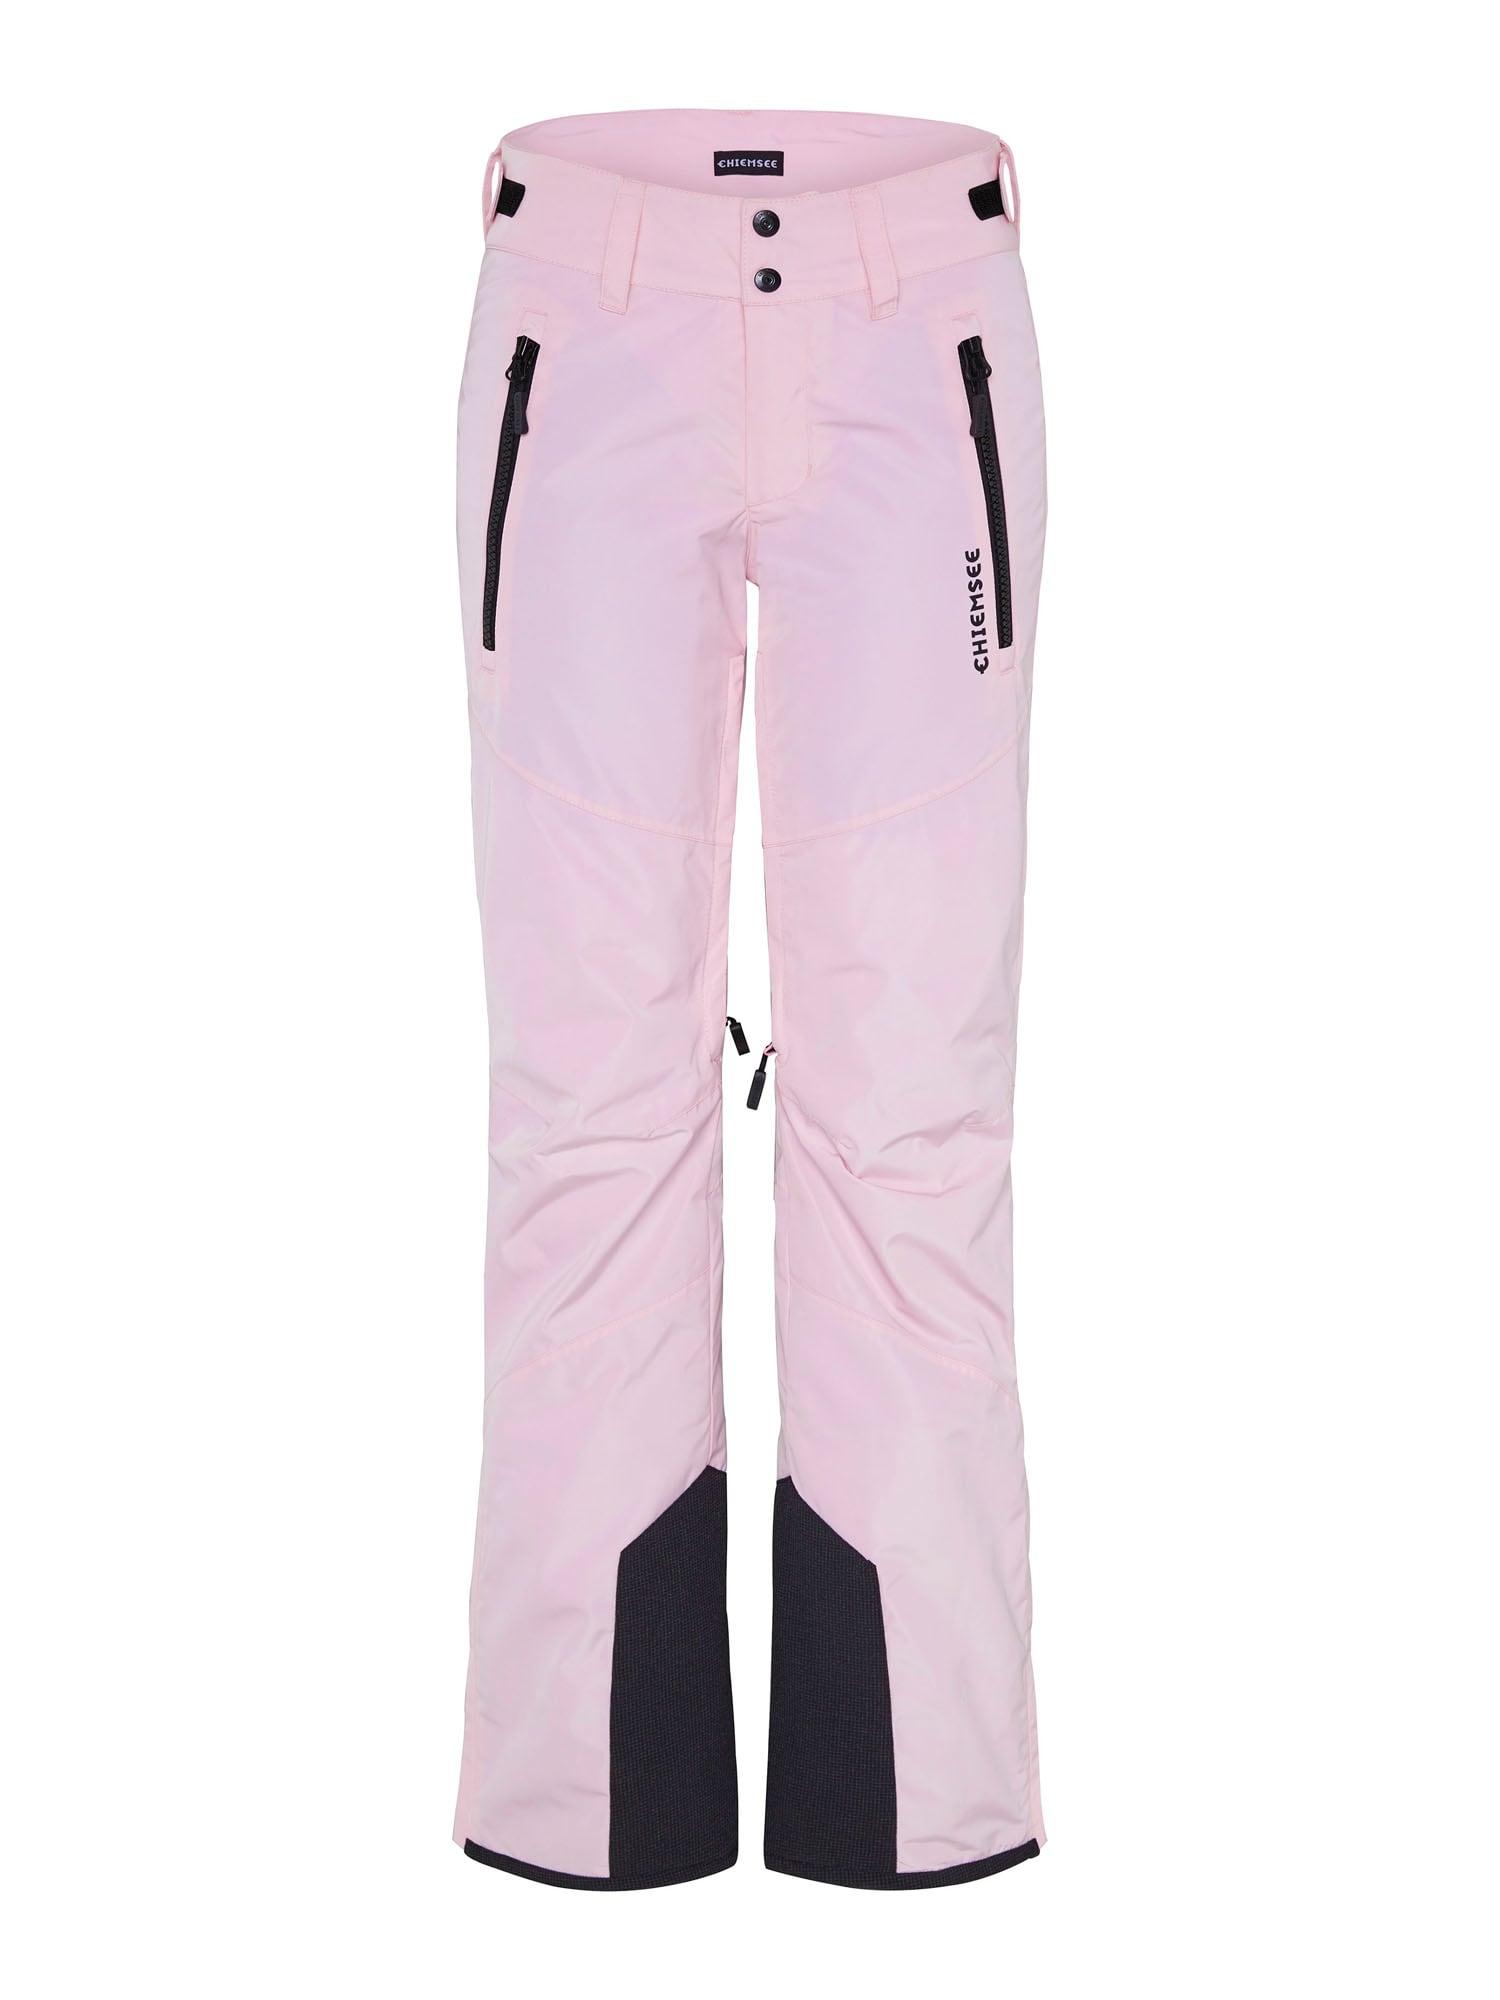 CHIEMSEE Outdoorové kalhoty 'Kizzy'  růžová / černá